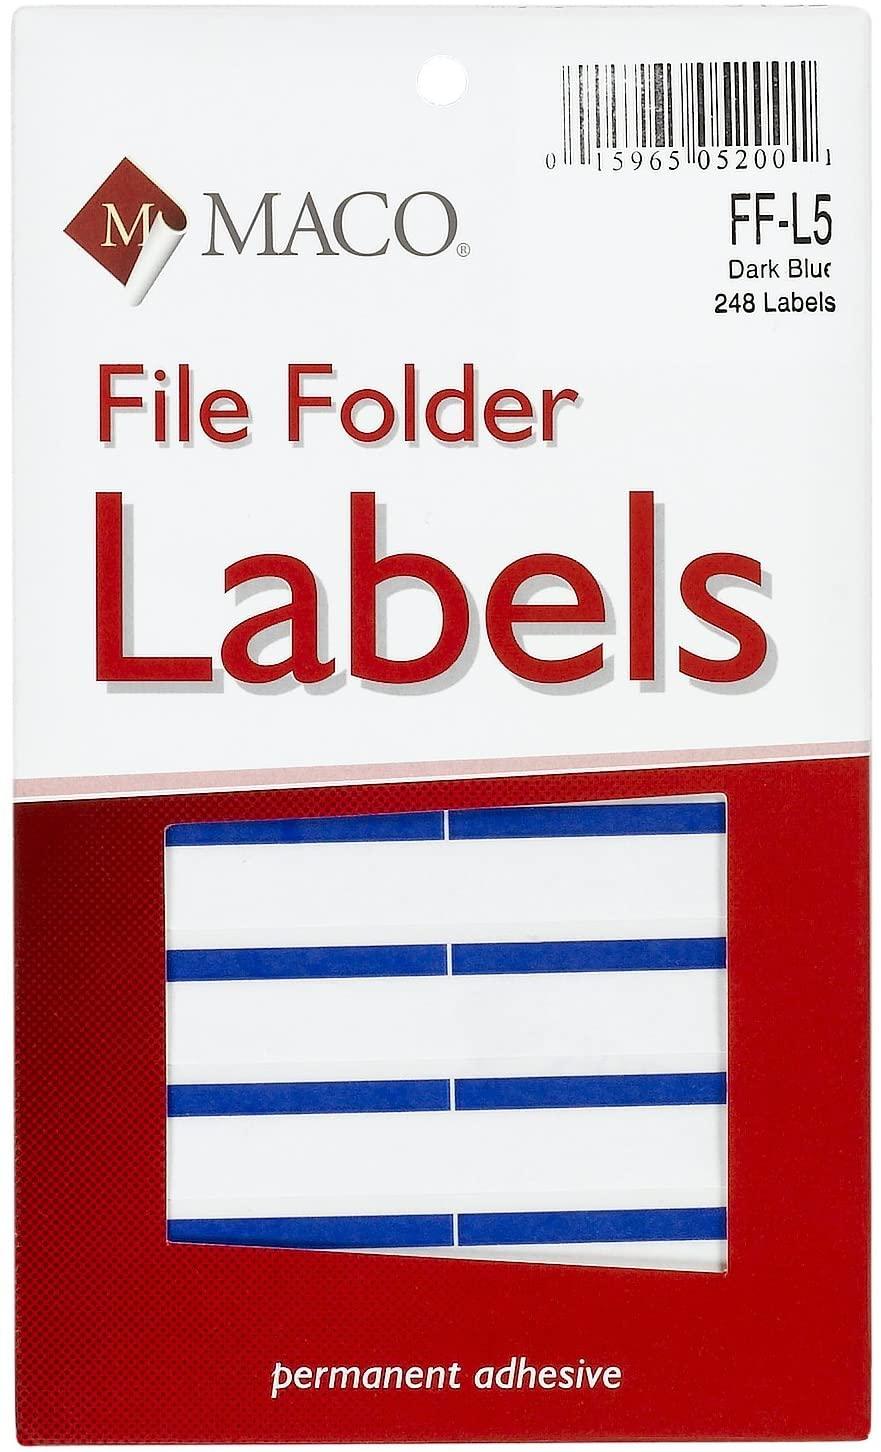 MACO Dark Blue File Folder Labels, 9/16 x 3-7/16 Inches, 248 Per Box (FF-L5)